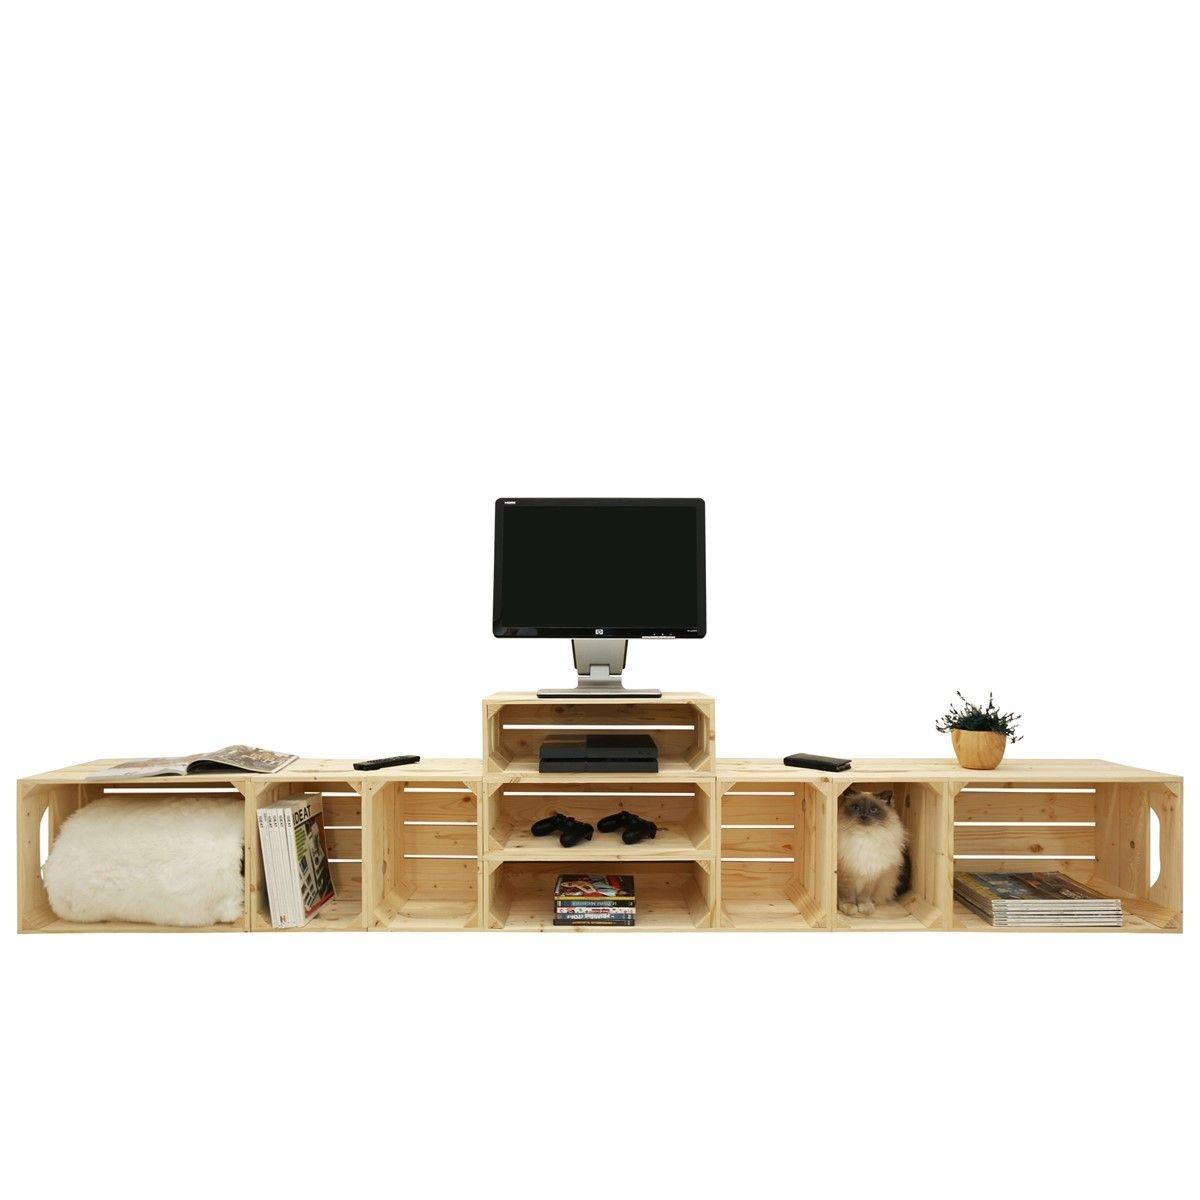 Meuble TV modulable 9 niches de rangement